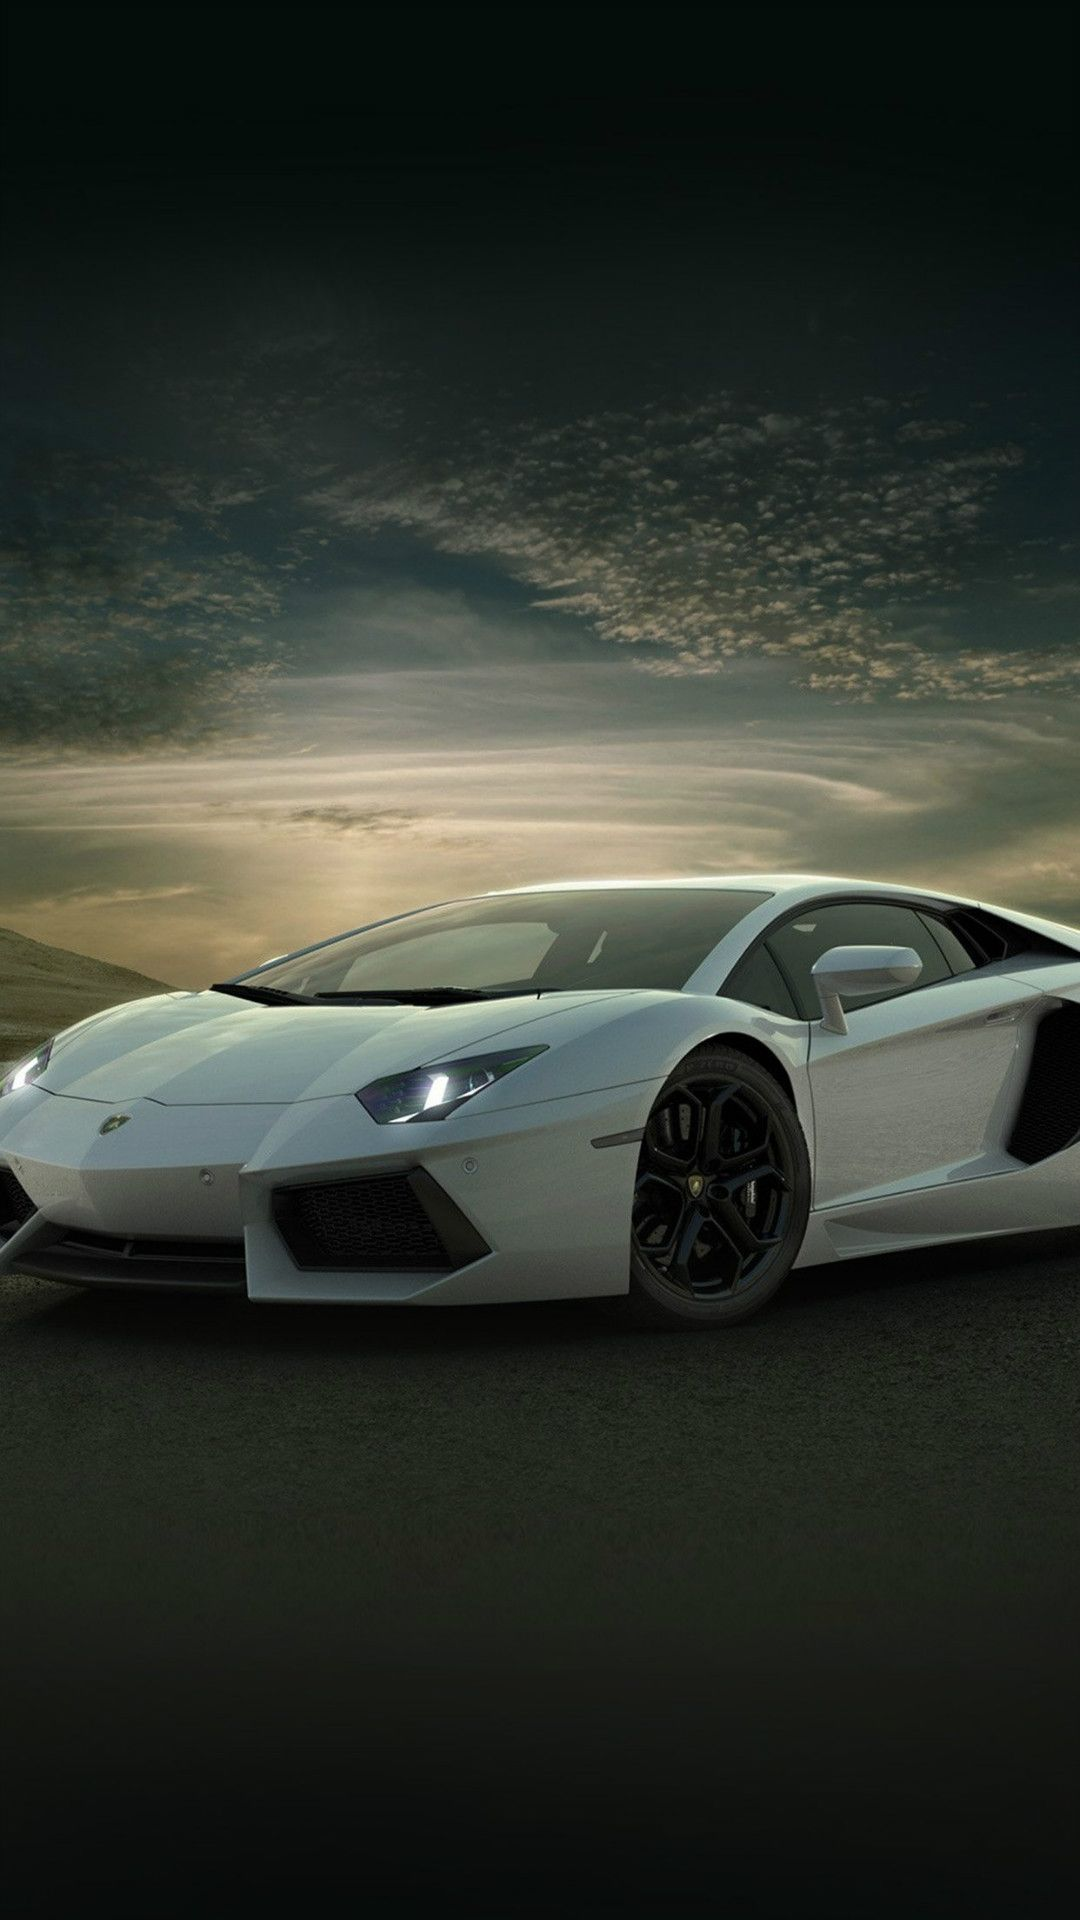 Attractive Lamborghini Car Exotic White Art #iPhone #7 #wallpaper Design Ideas